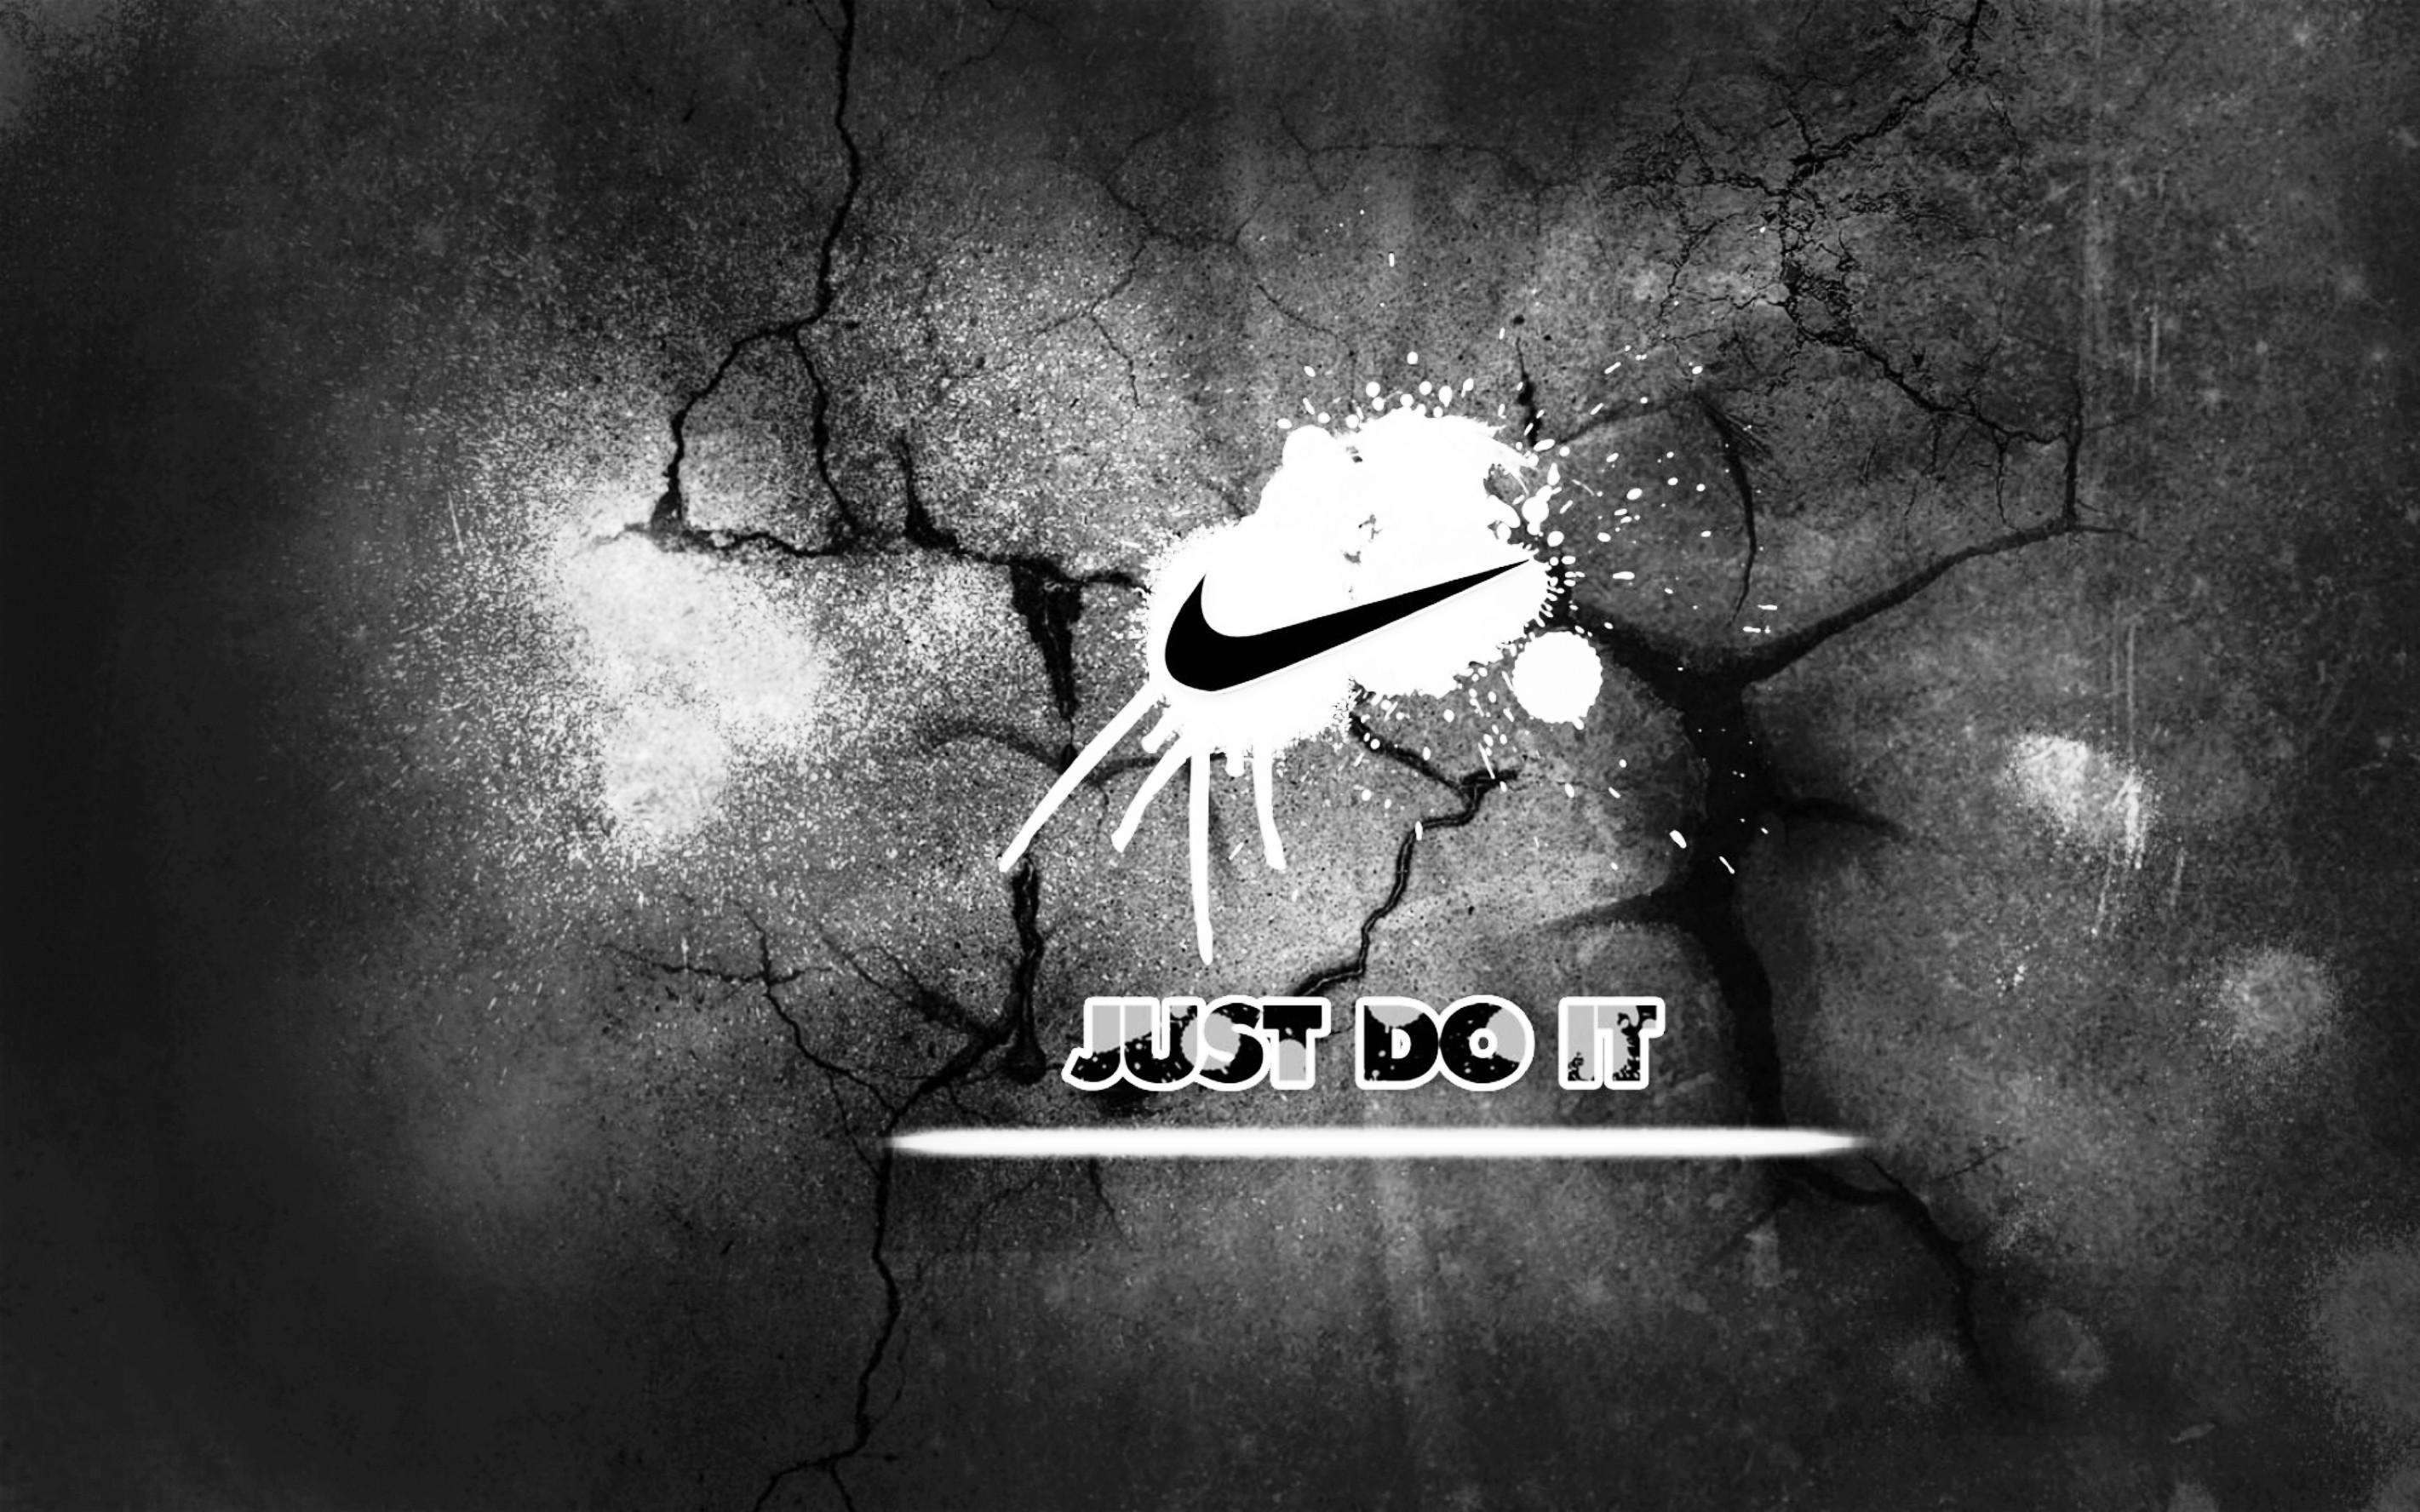 Nike just do it wallpaper.